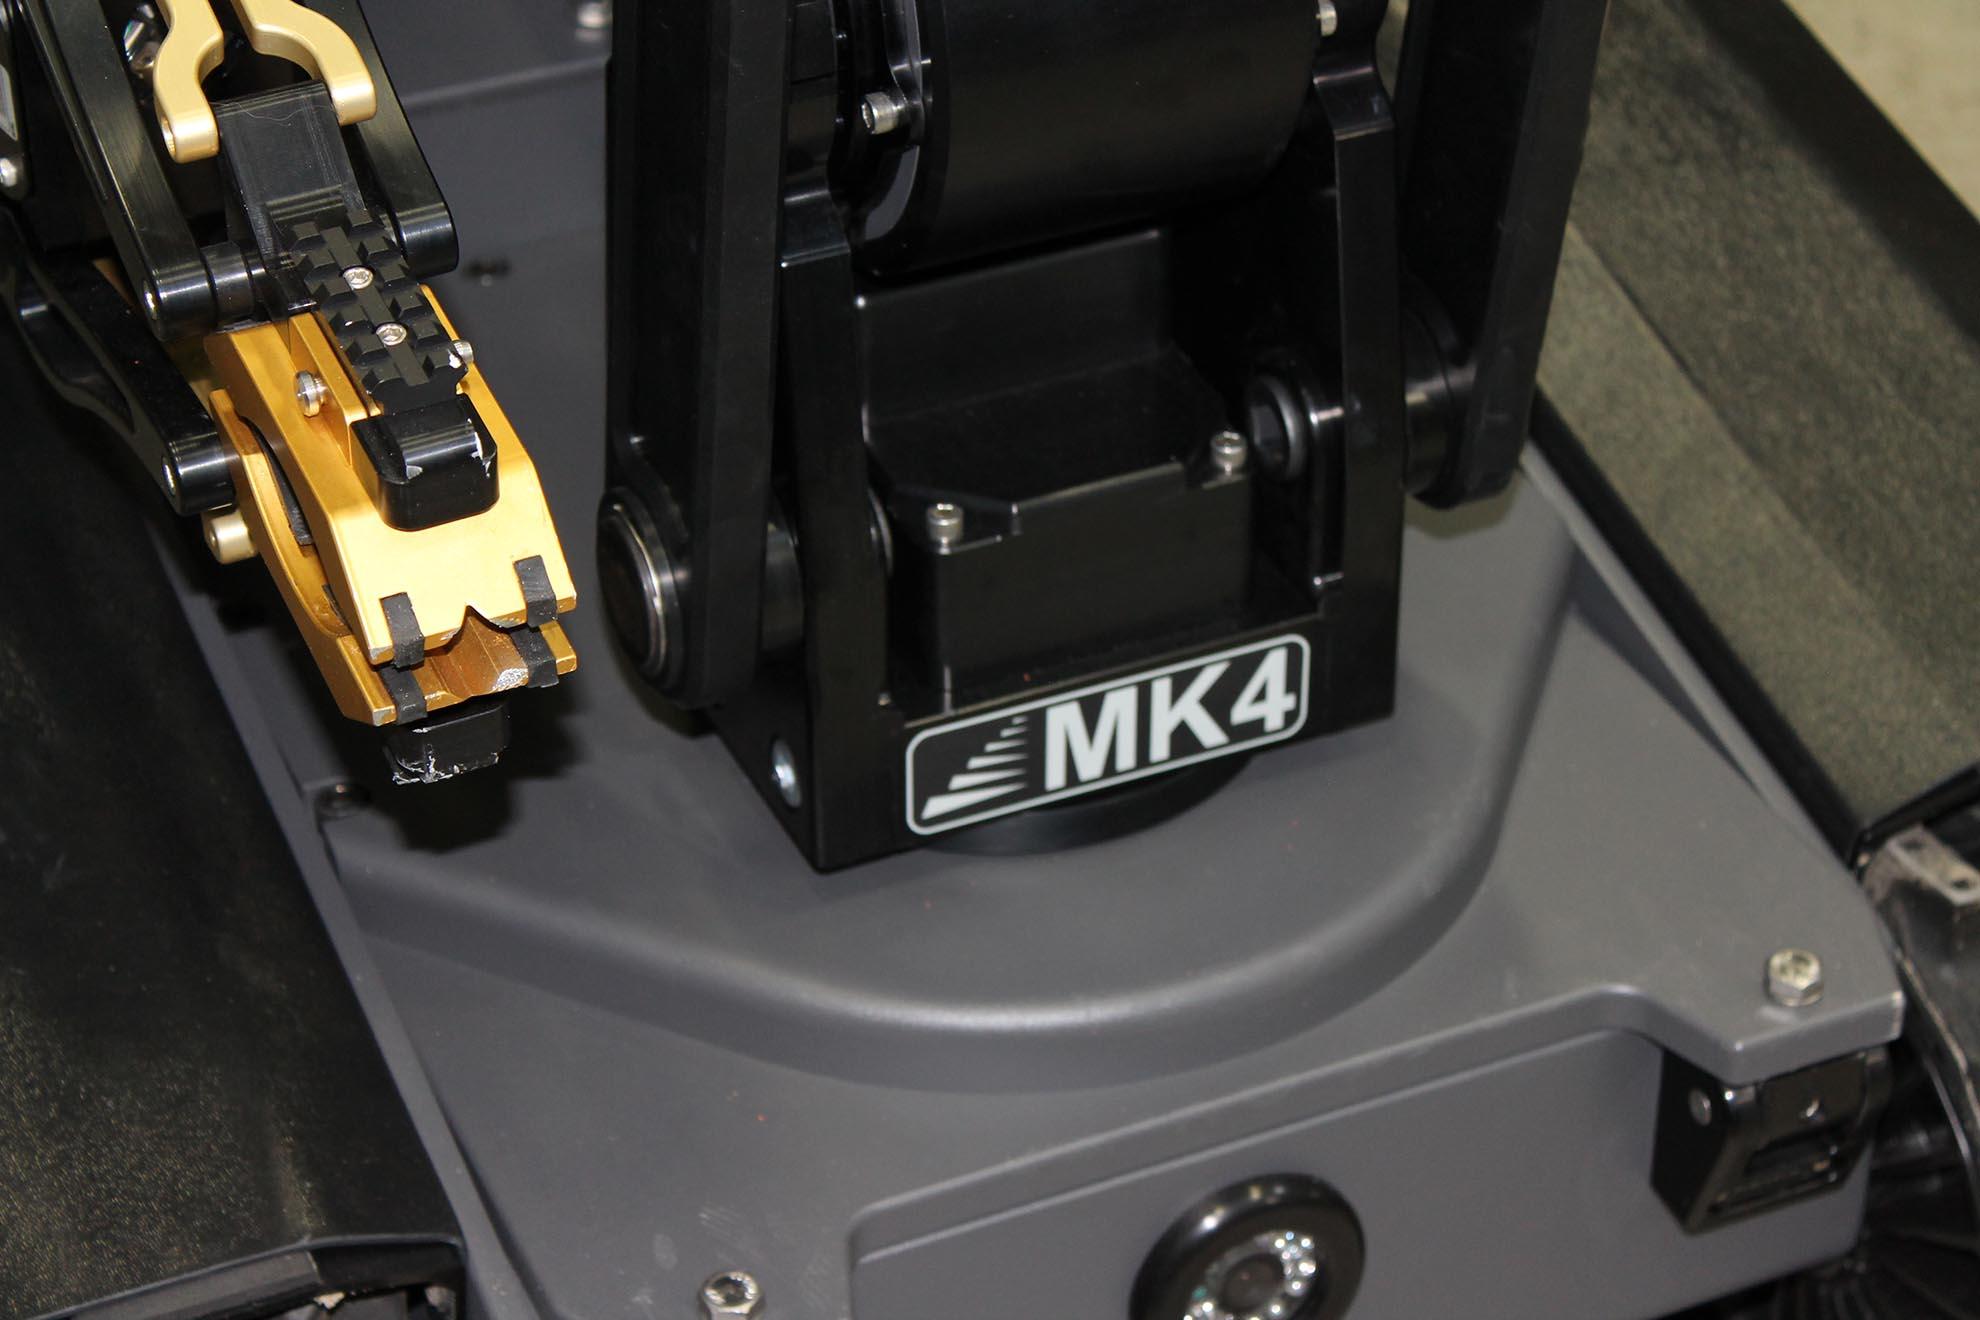 caliber-mk4-lvbied-robot-deck-shot